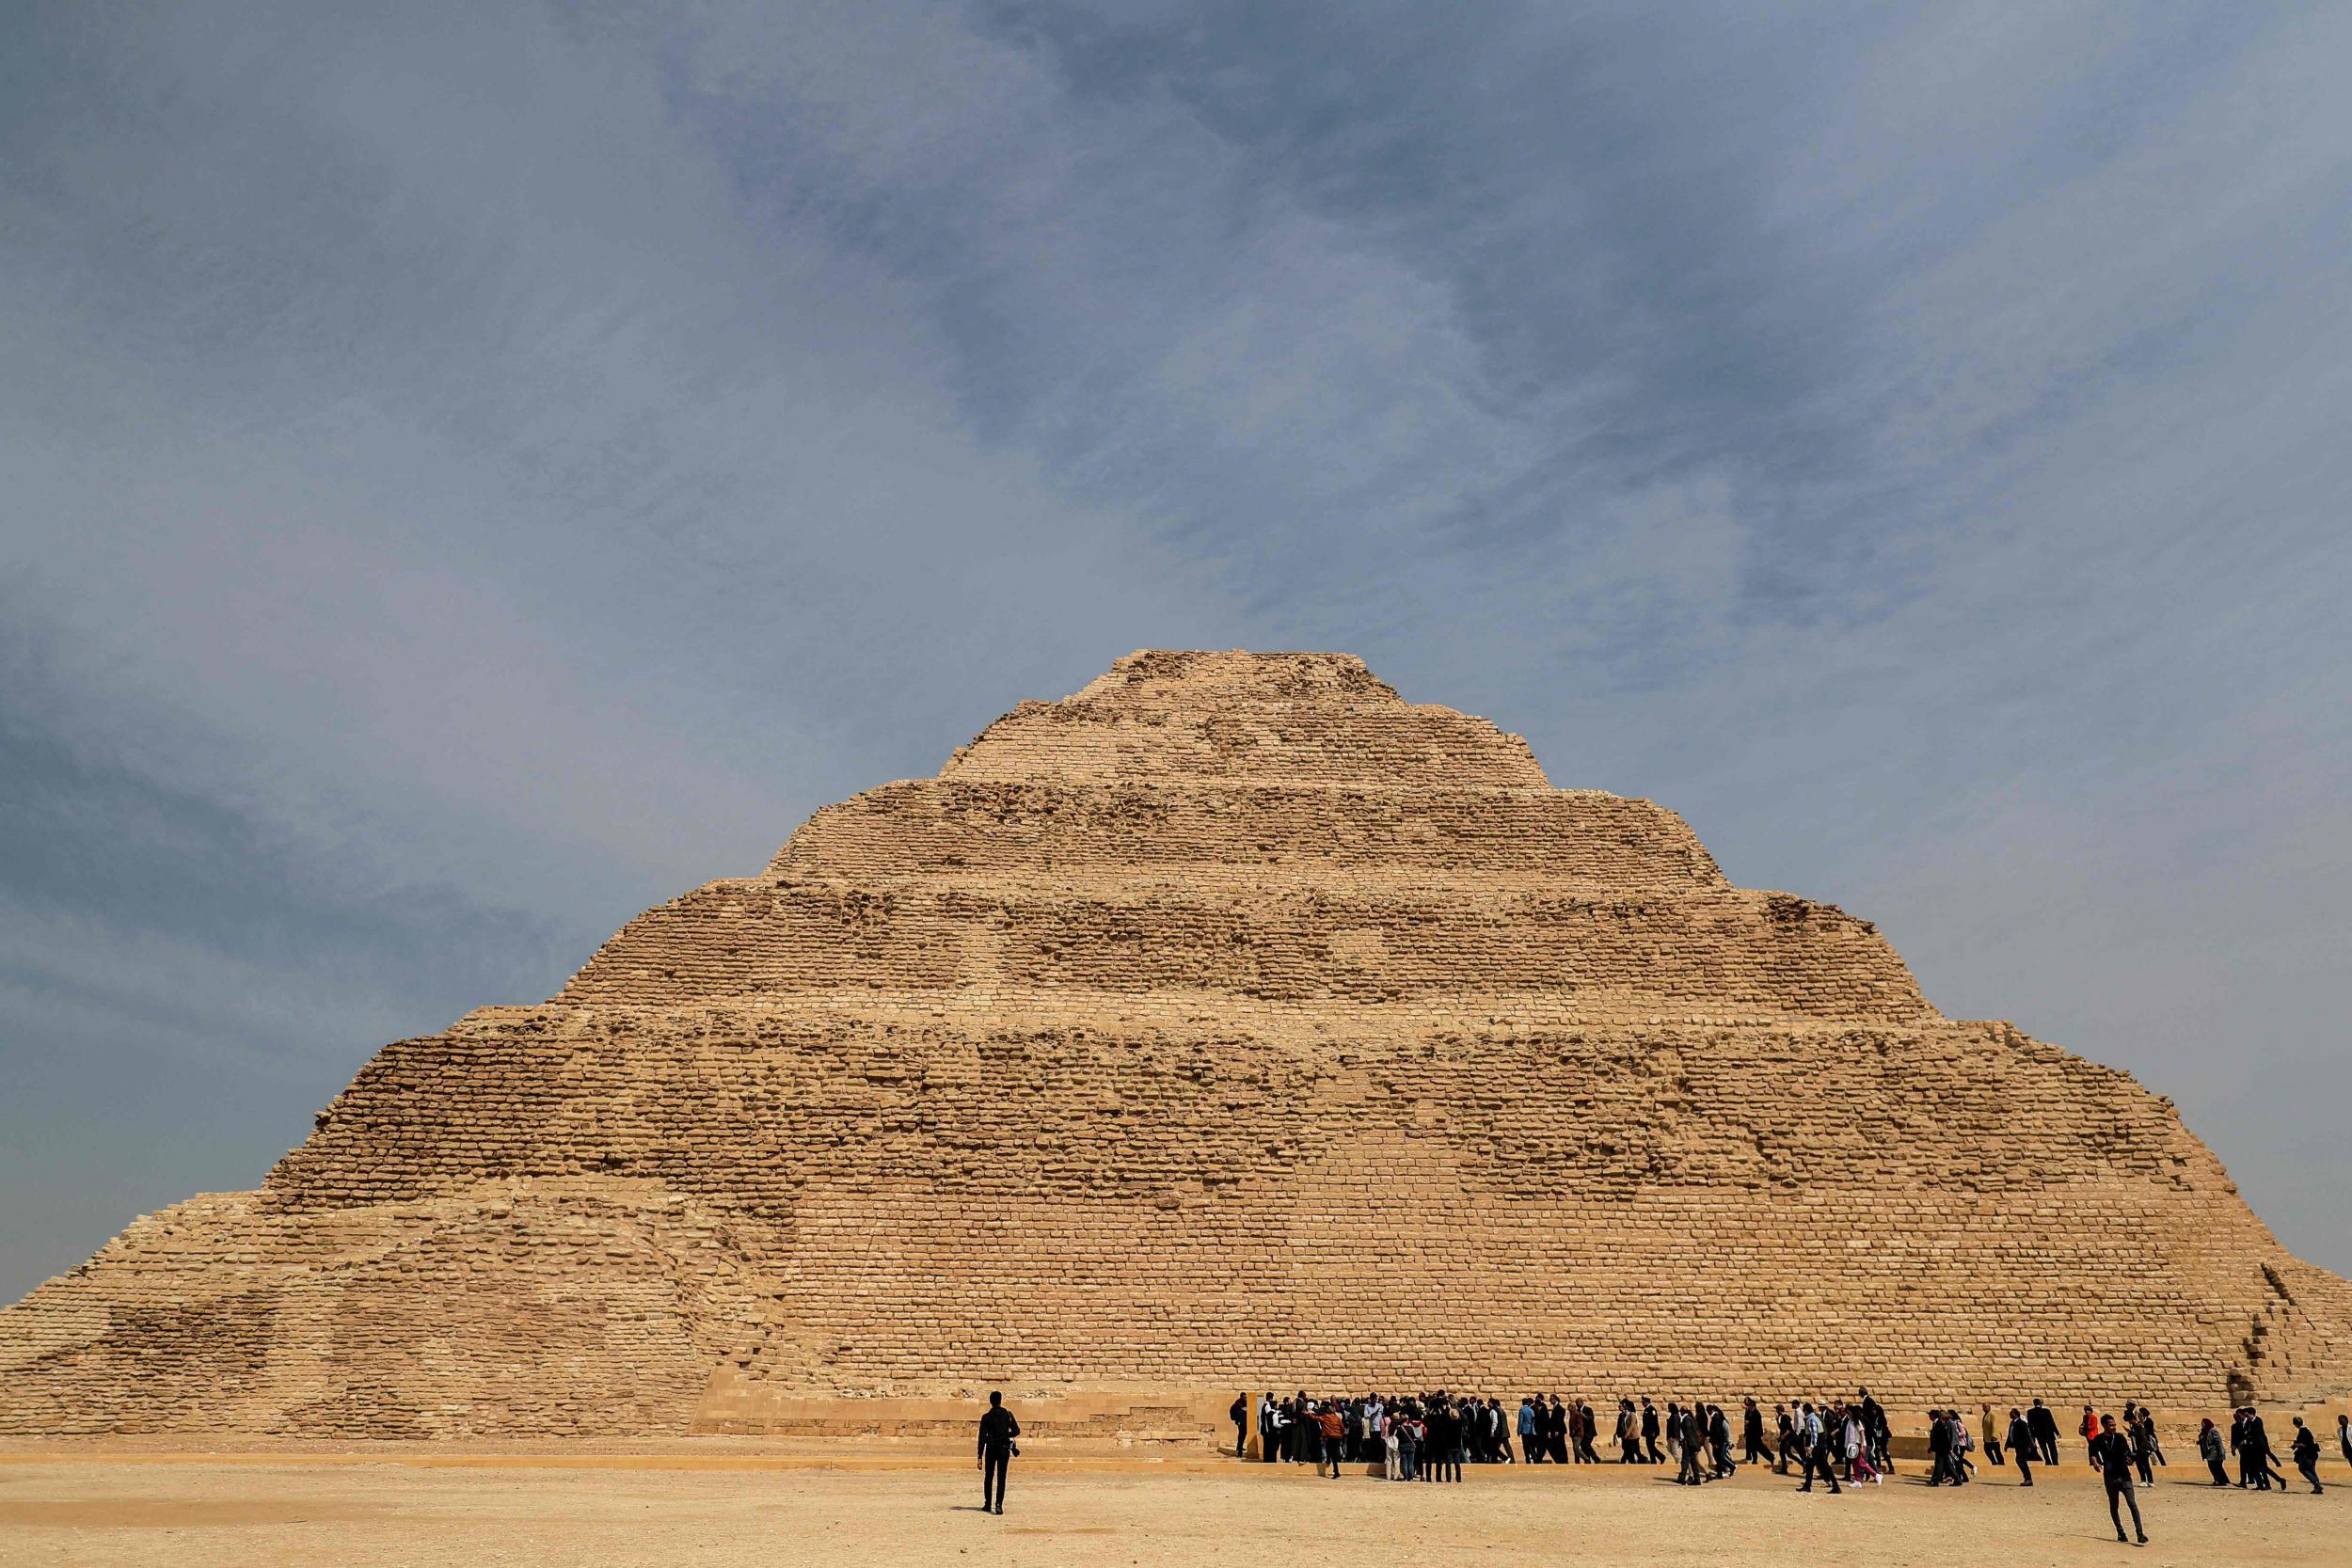 Egypt reopens its oldest pyramid after £5m restoration | The IndependentShapeleftrightShape